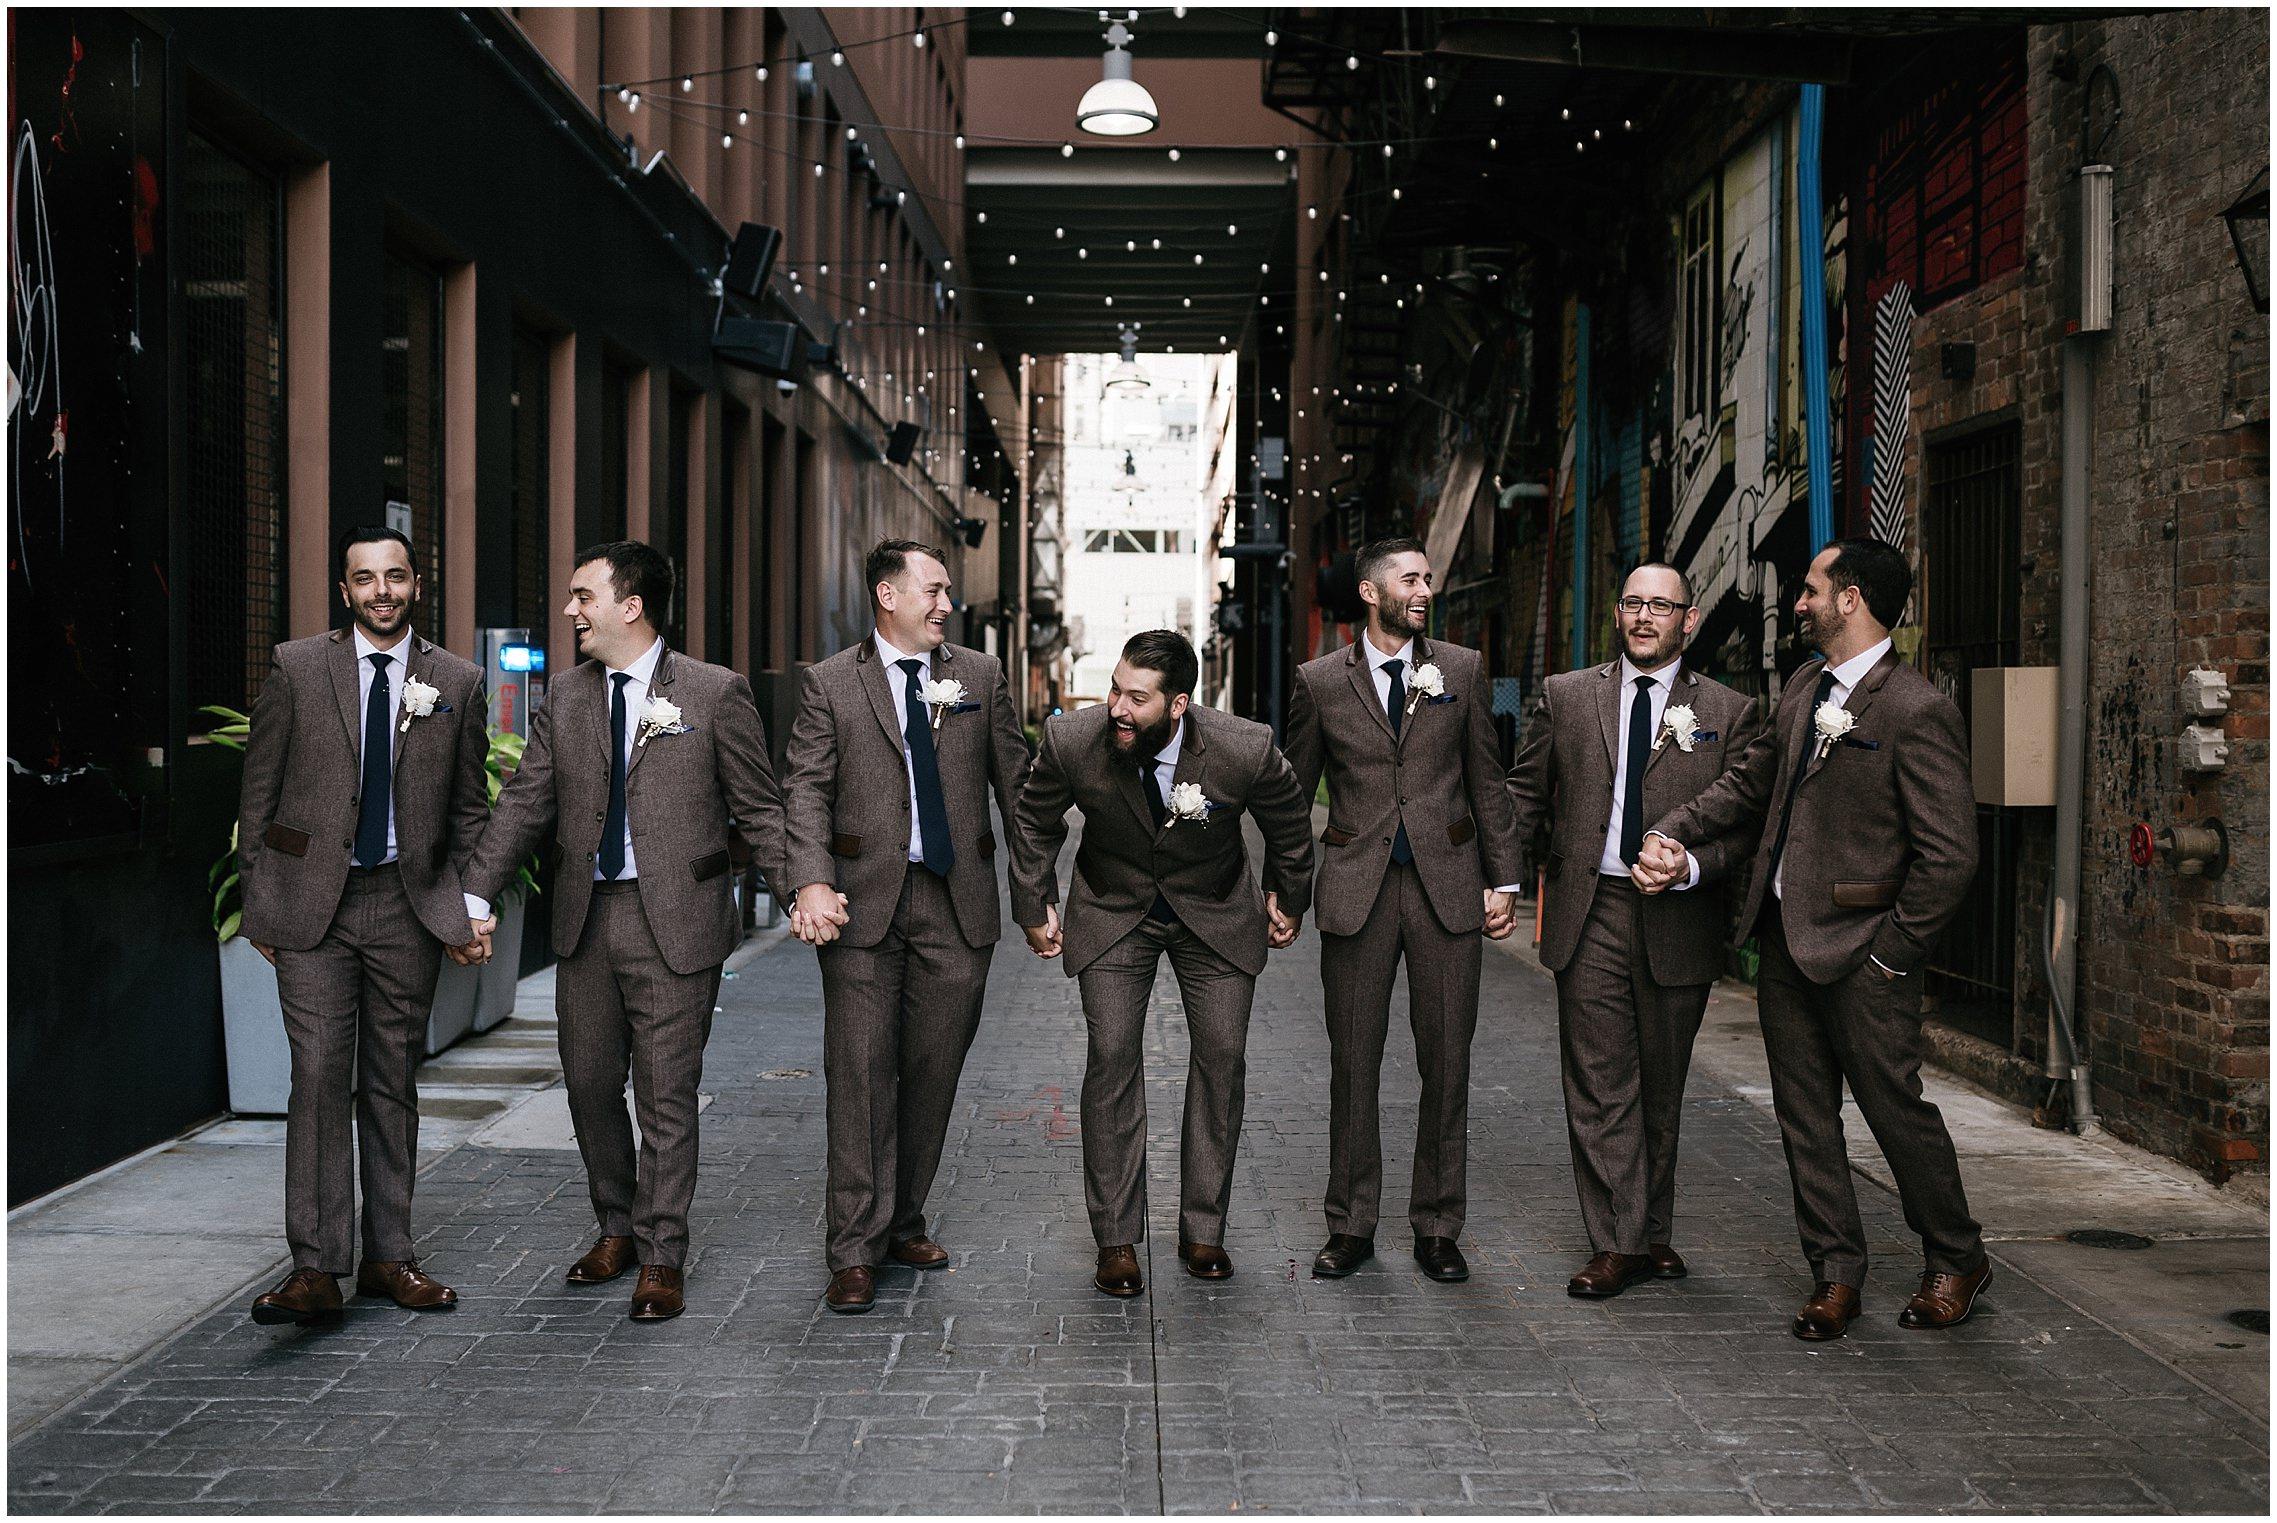 brick_and_mortar_colorado_wedding_photographer_0219.jpg